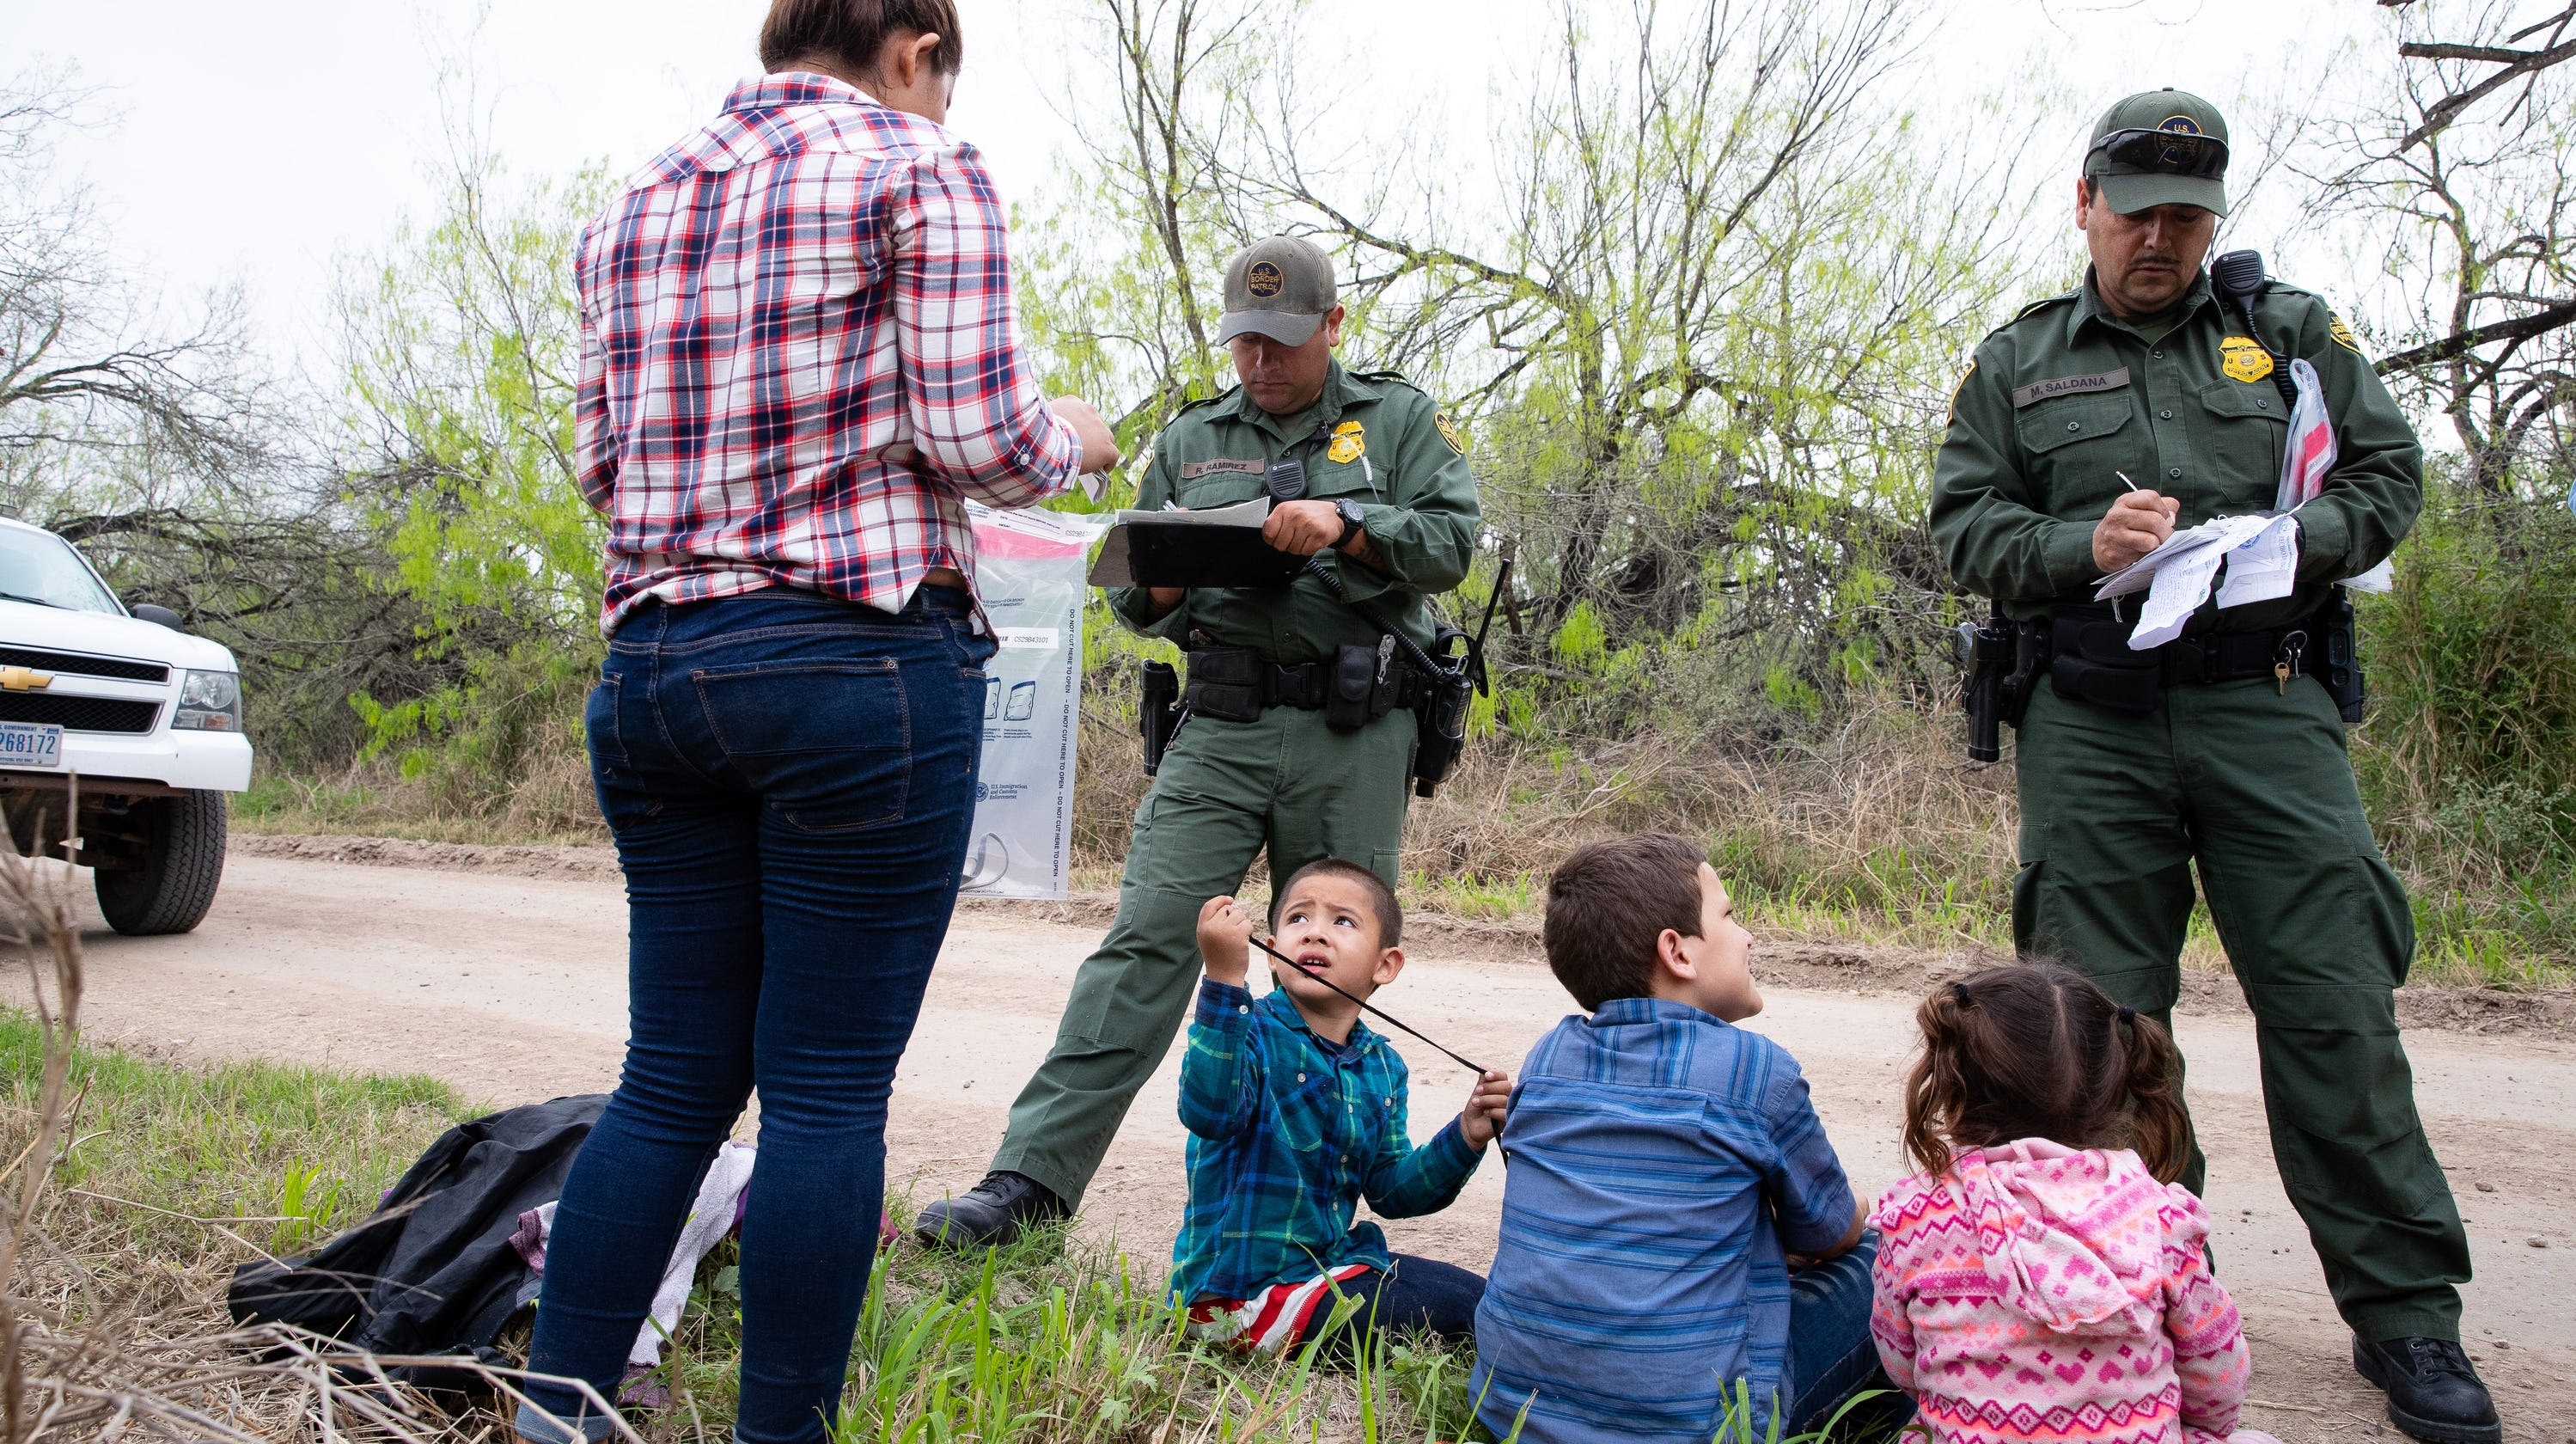 Border Patrol: 300 percent spike in family apprehensions creates 'humanitarian crisis'